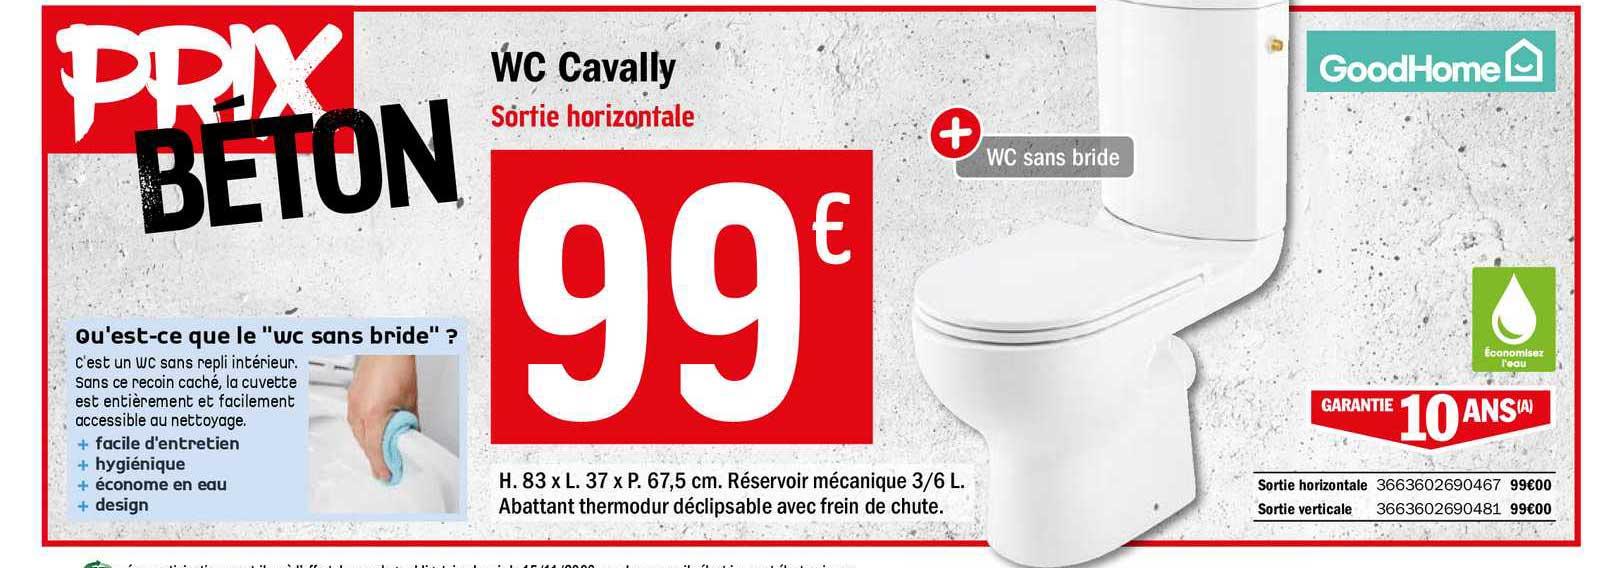 Offre Wc Cavally Chez Brico Depot